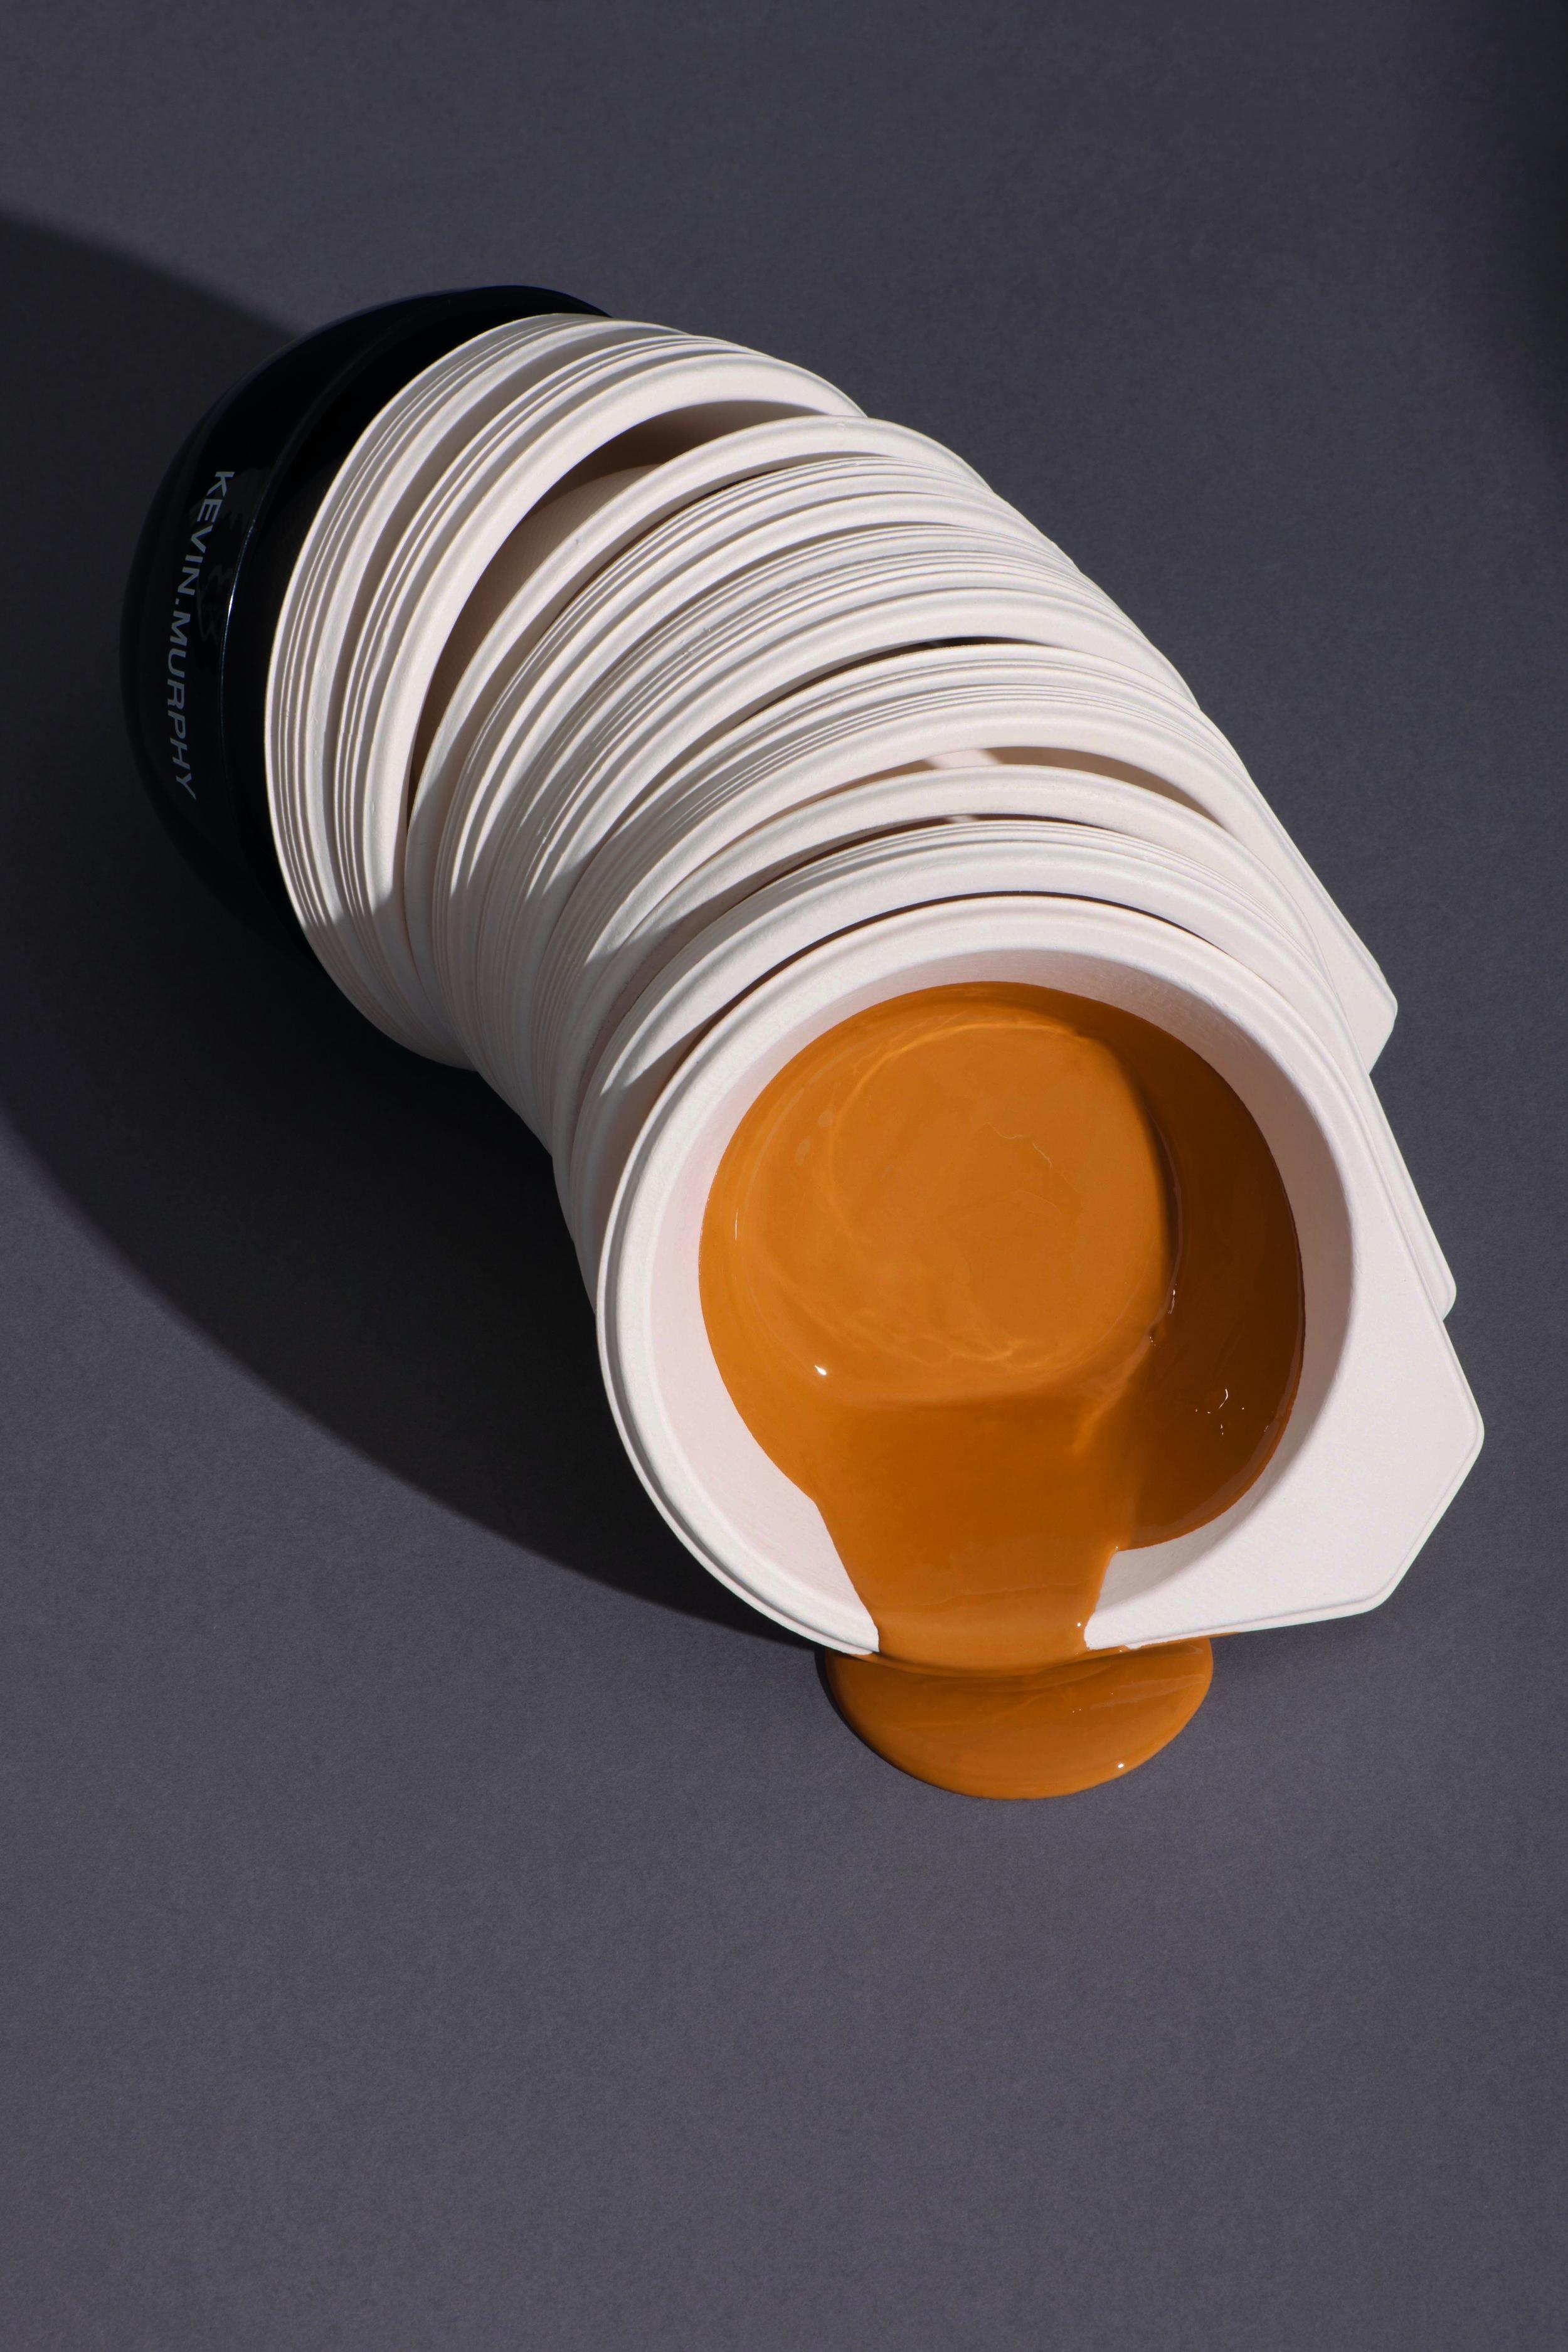 wantcolor.me? - Want to use our molecular couple guaranteed color in your salon?Ben jij klaar om onze nieuwe revolutionaire haarkleur te ontdekken?A la recherche d'une nouvelle gamme de coloration?